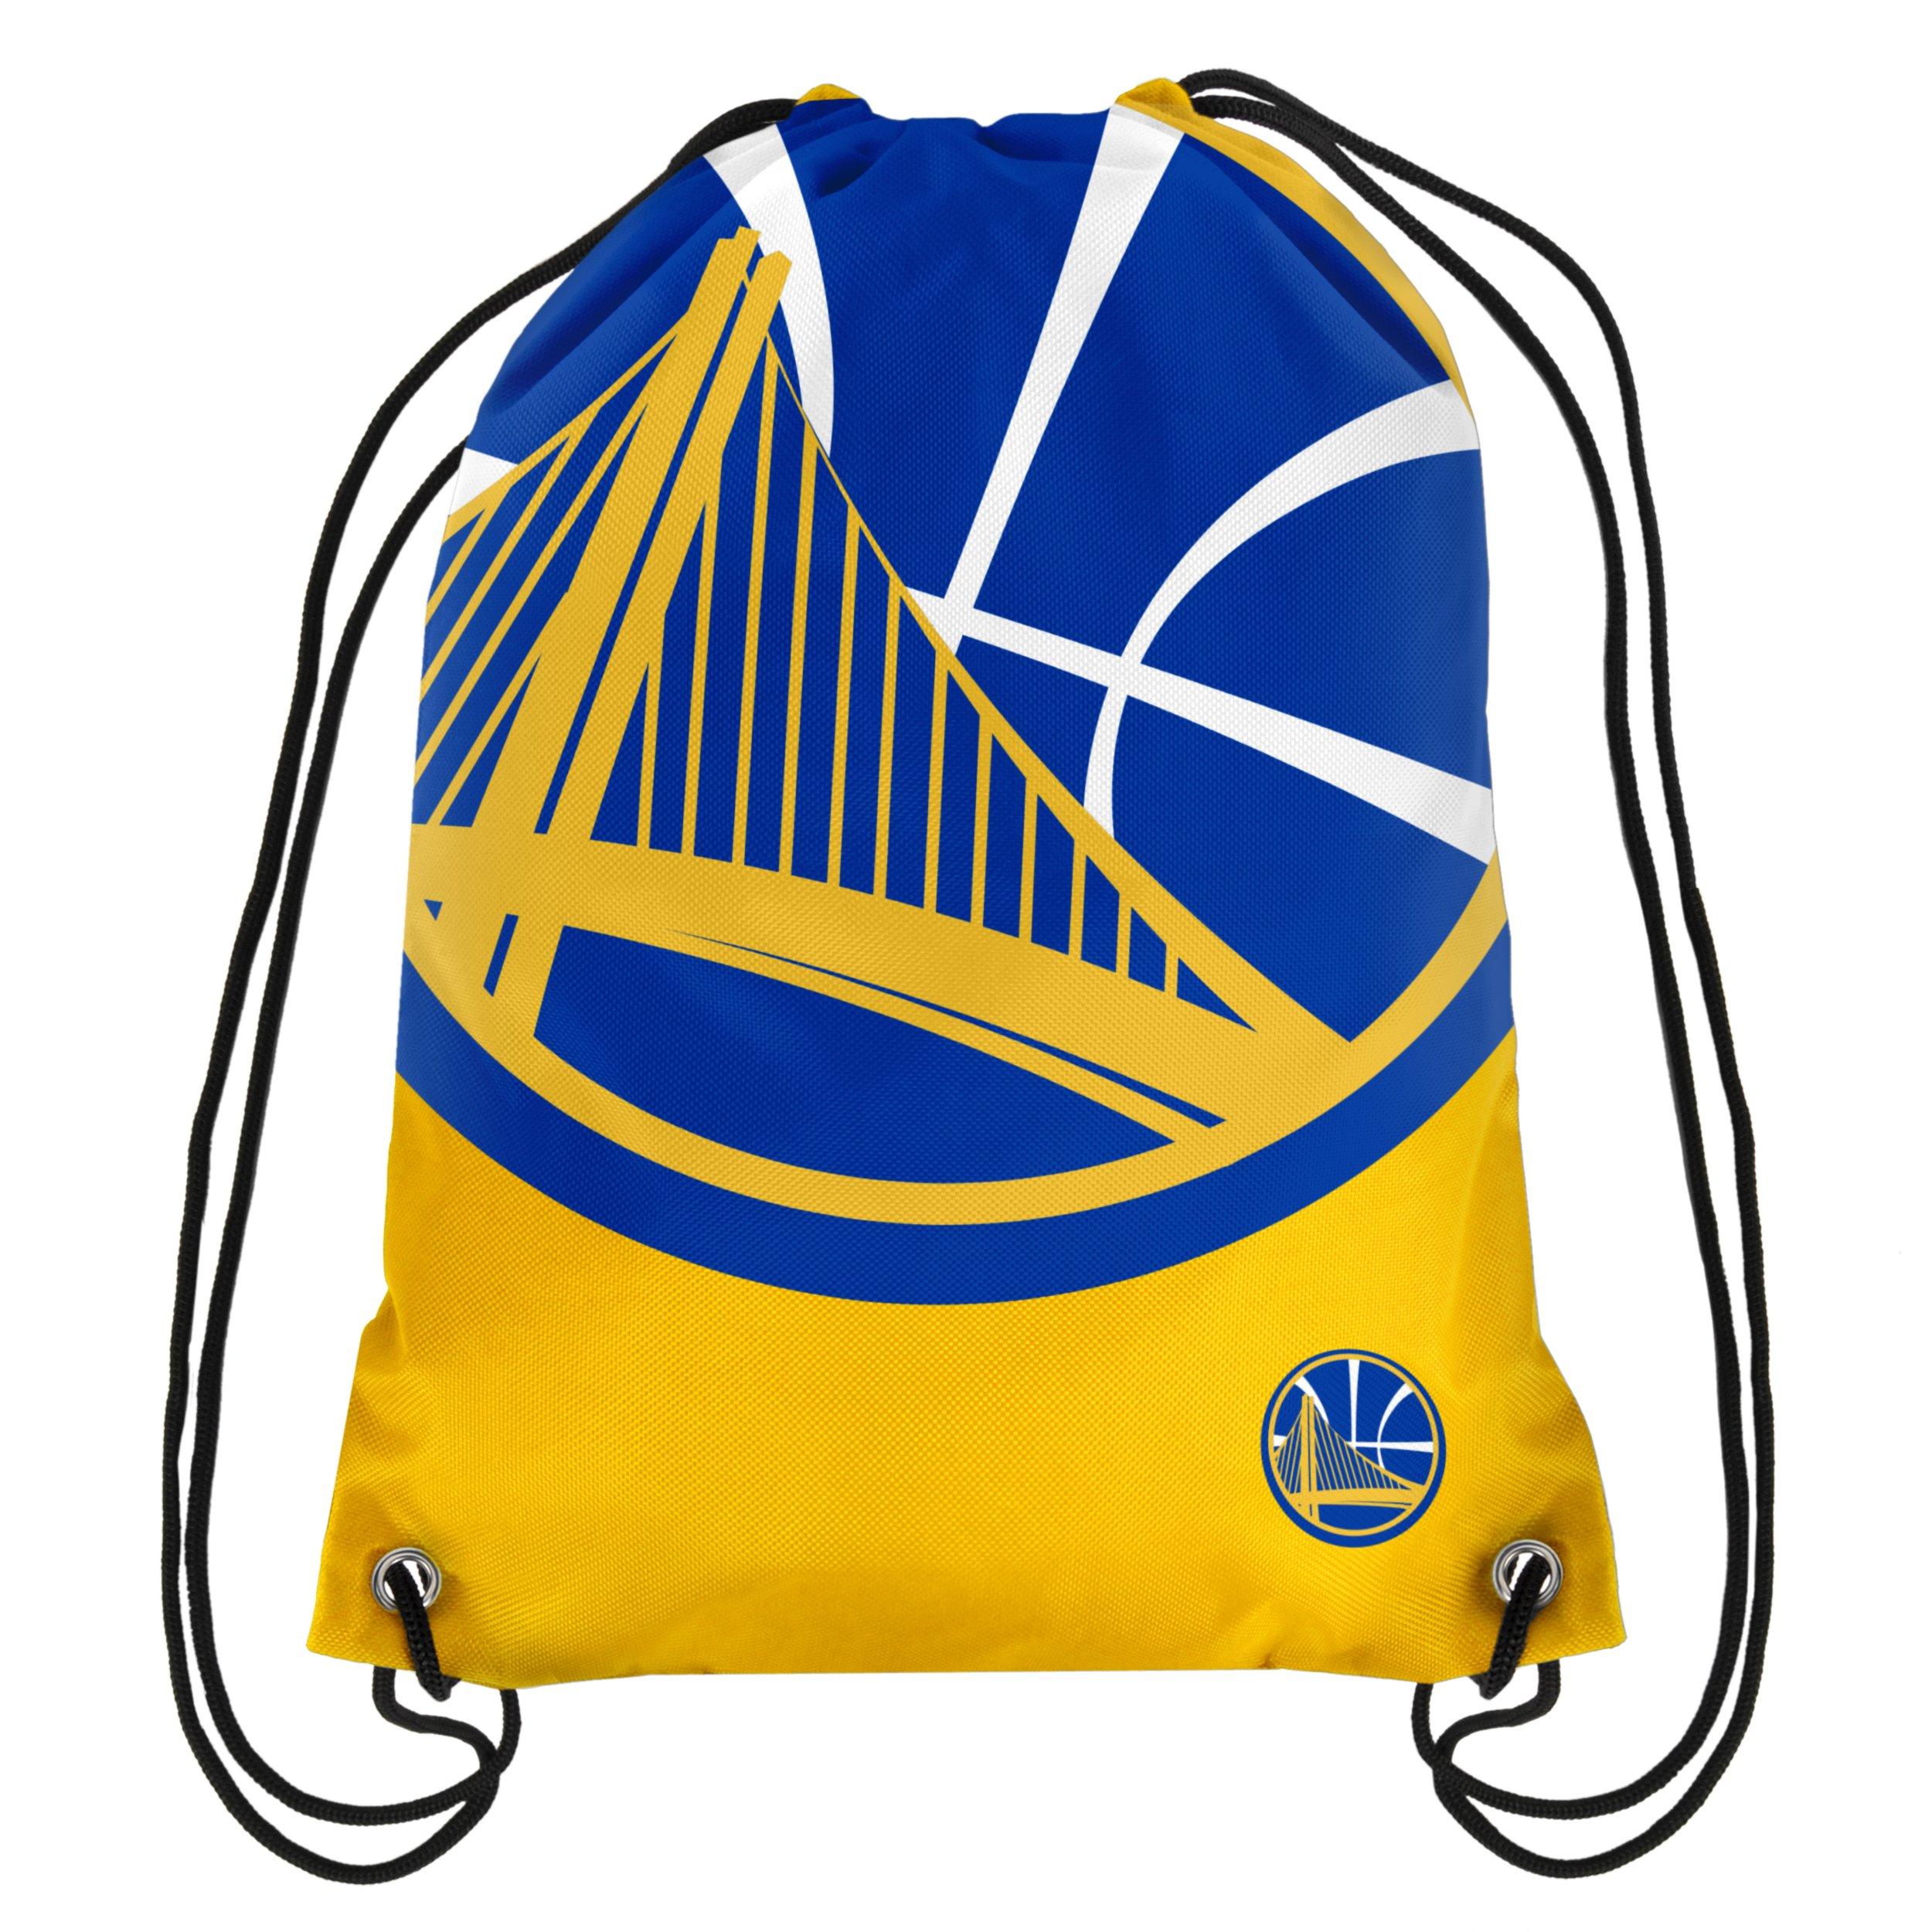 FOCO NBA Golden State Warriorssmu 2015 Modells Drawstring Bag, Golden State Warriors, One Size